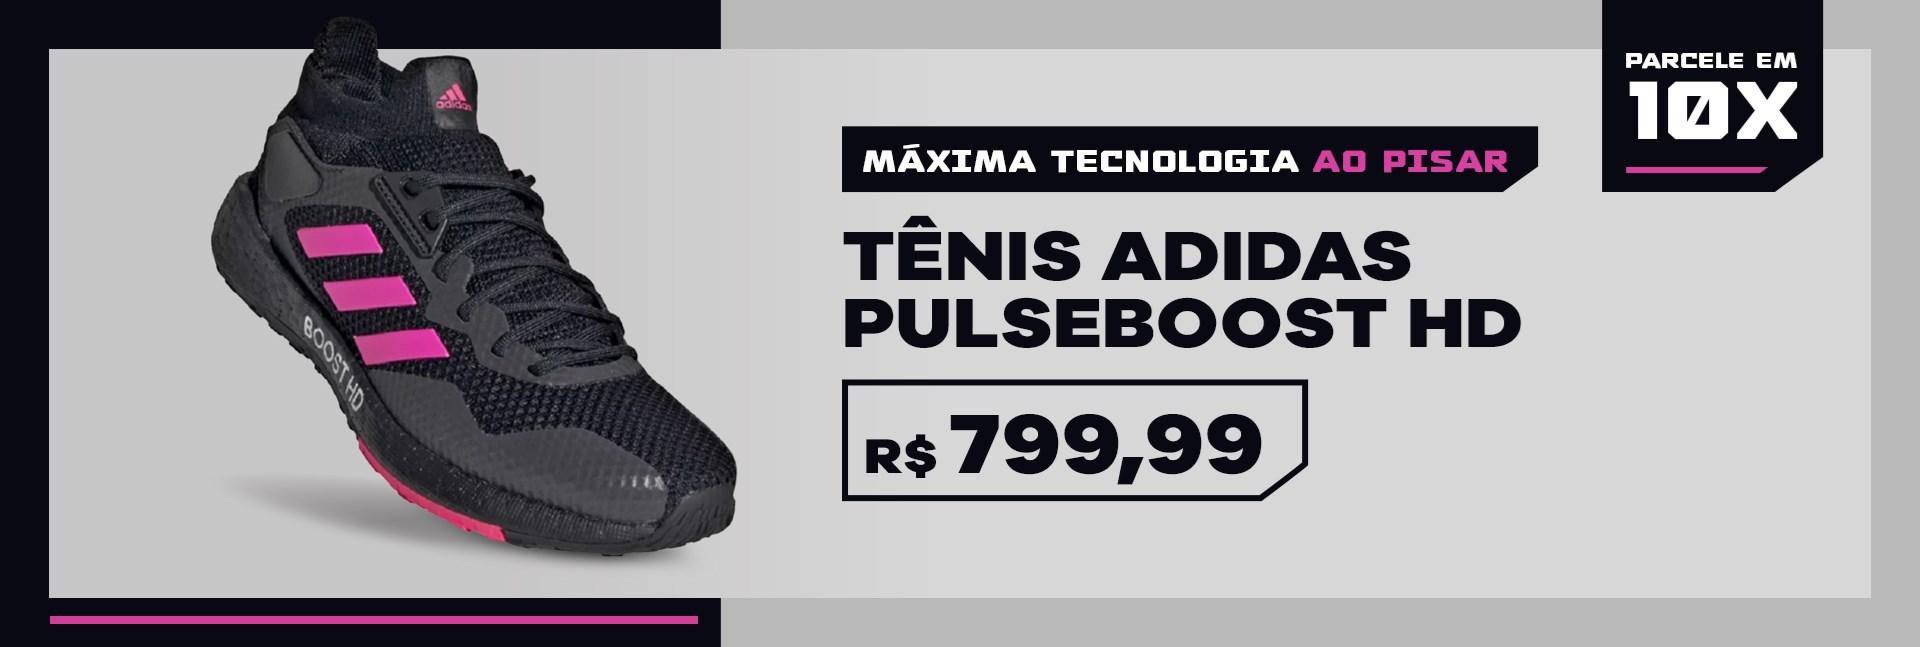 Tenis adidas Pulseboost HD